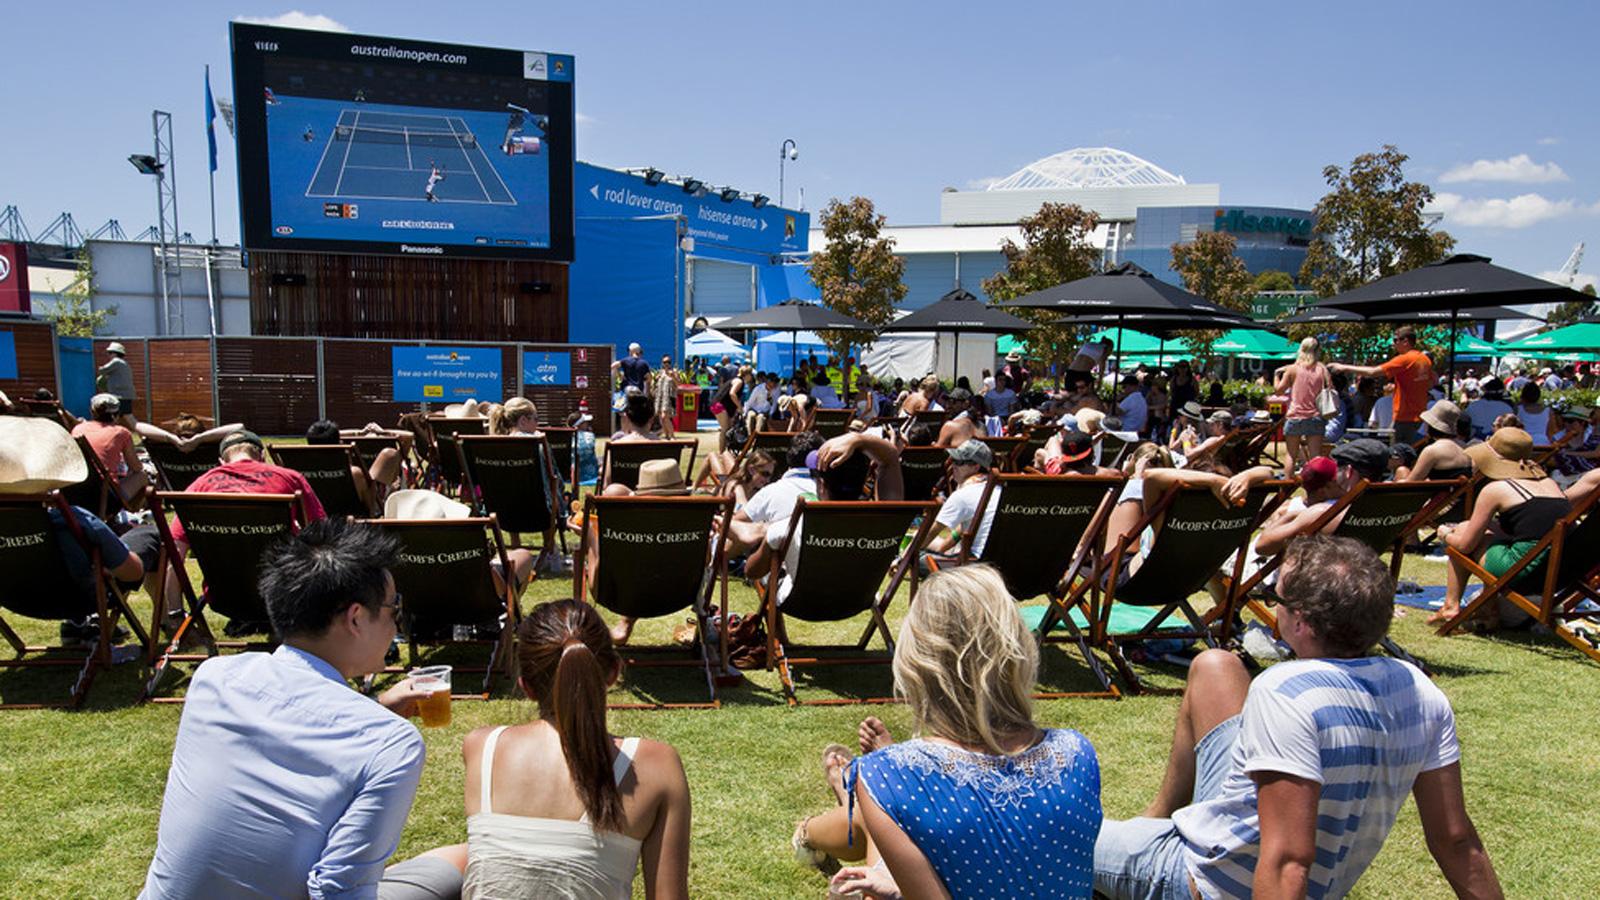 Australian Open, Melbourne, Victoria, Australia